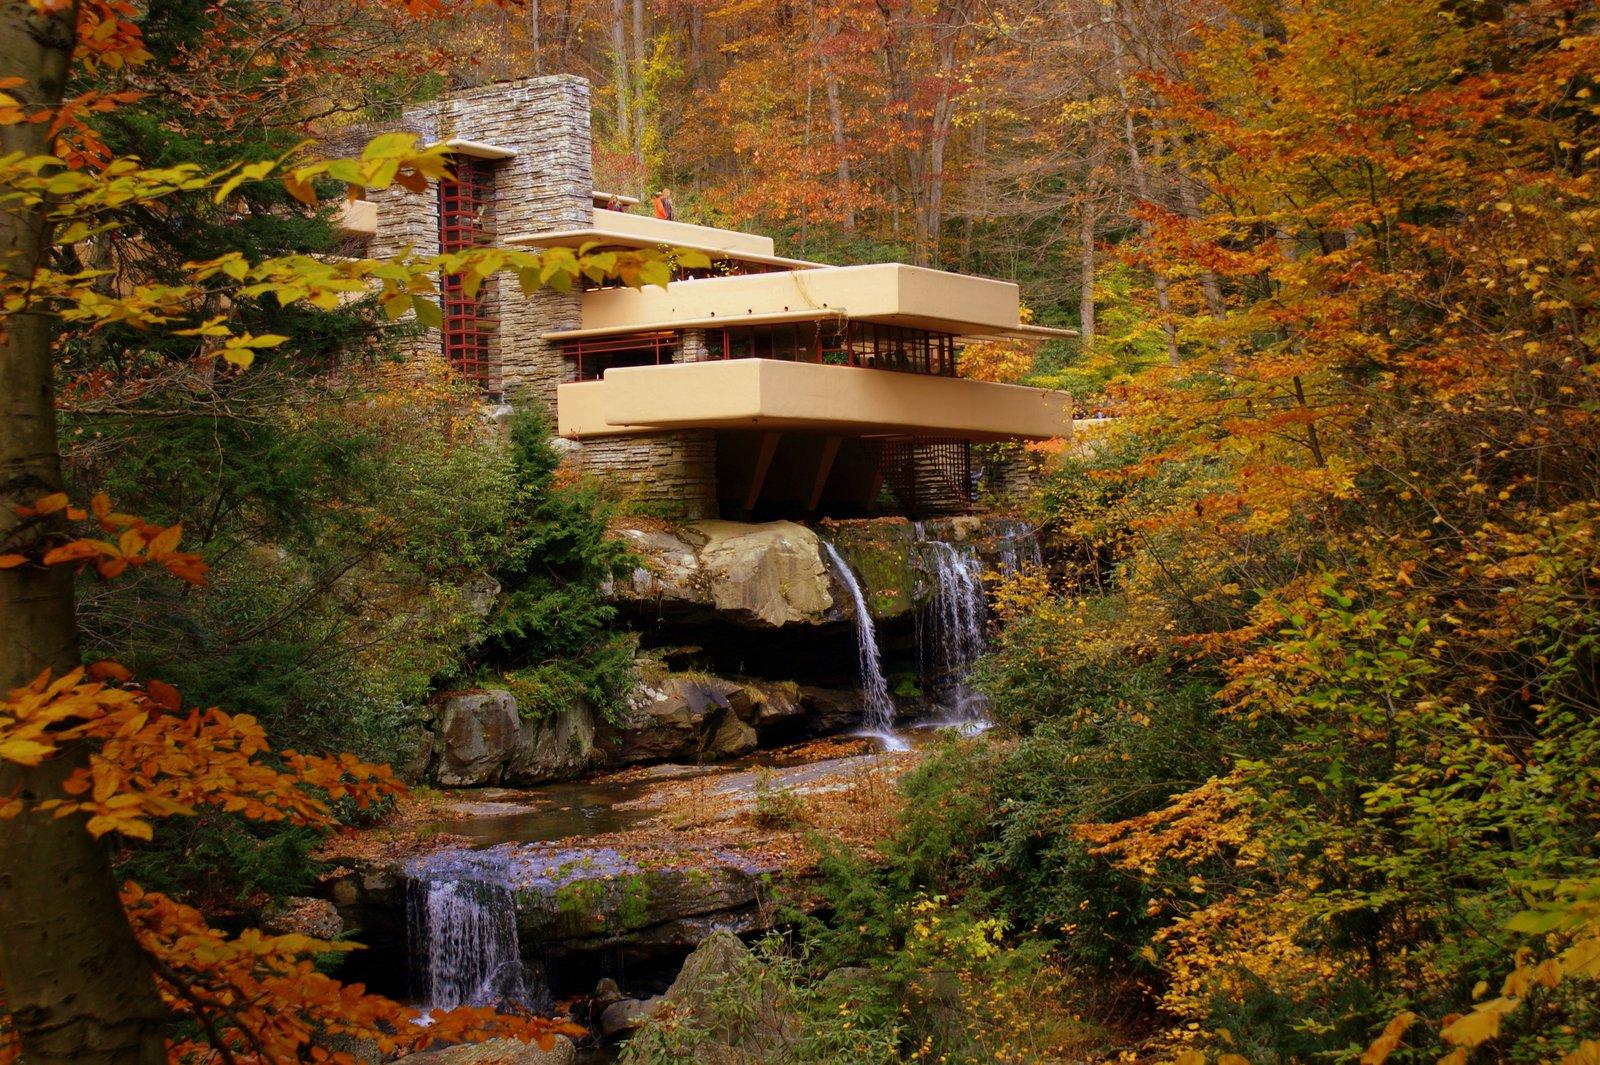 fallingwater viewing gallery